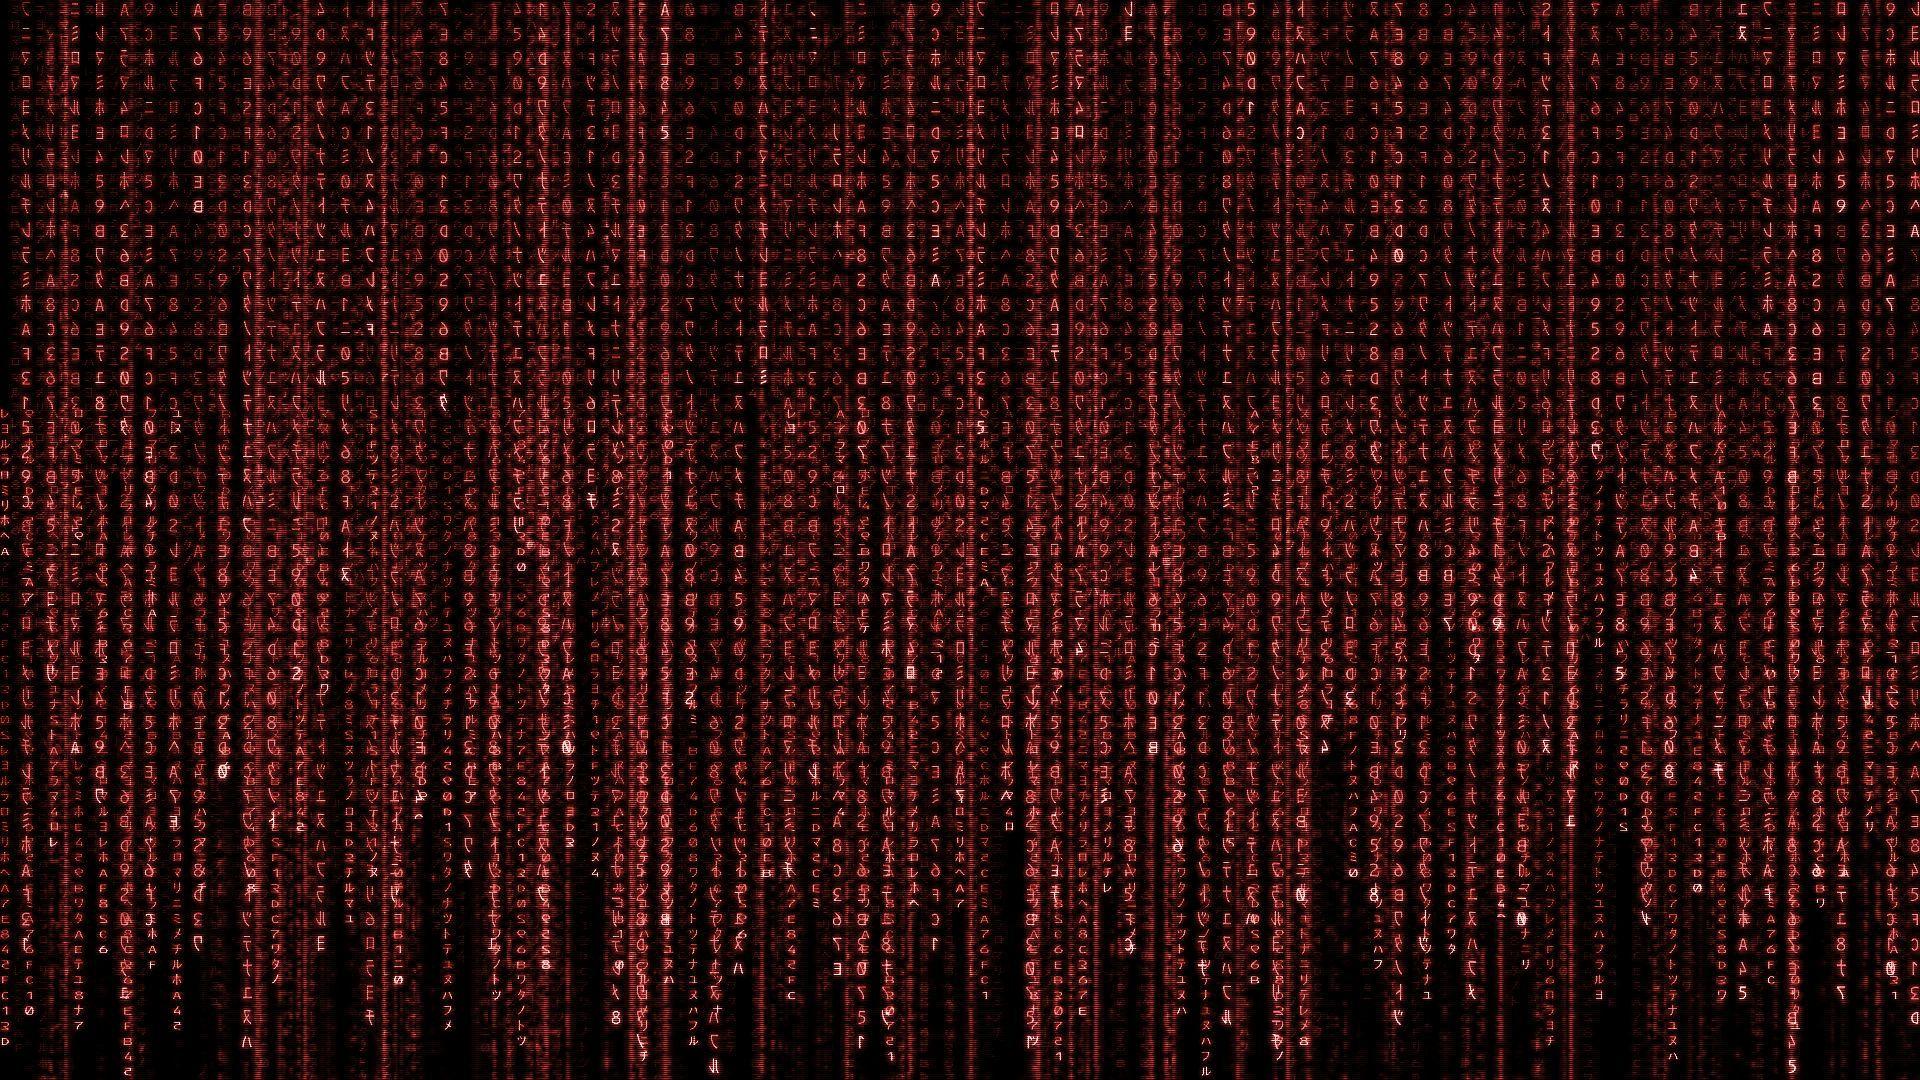 43 blue matrix code wallpaper live on wallpapersafari - Binary background gif ...